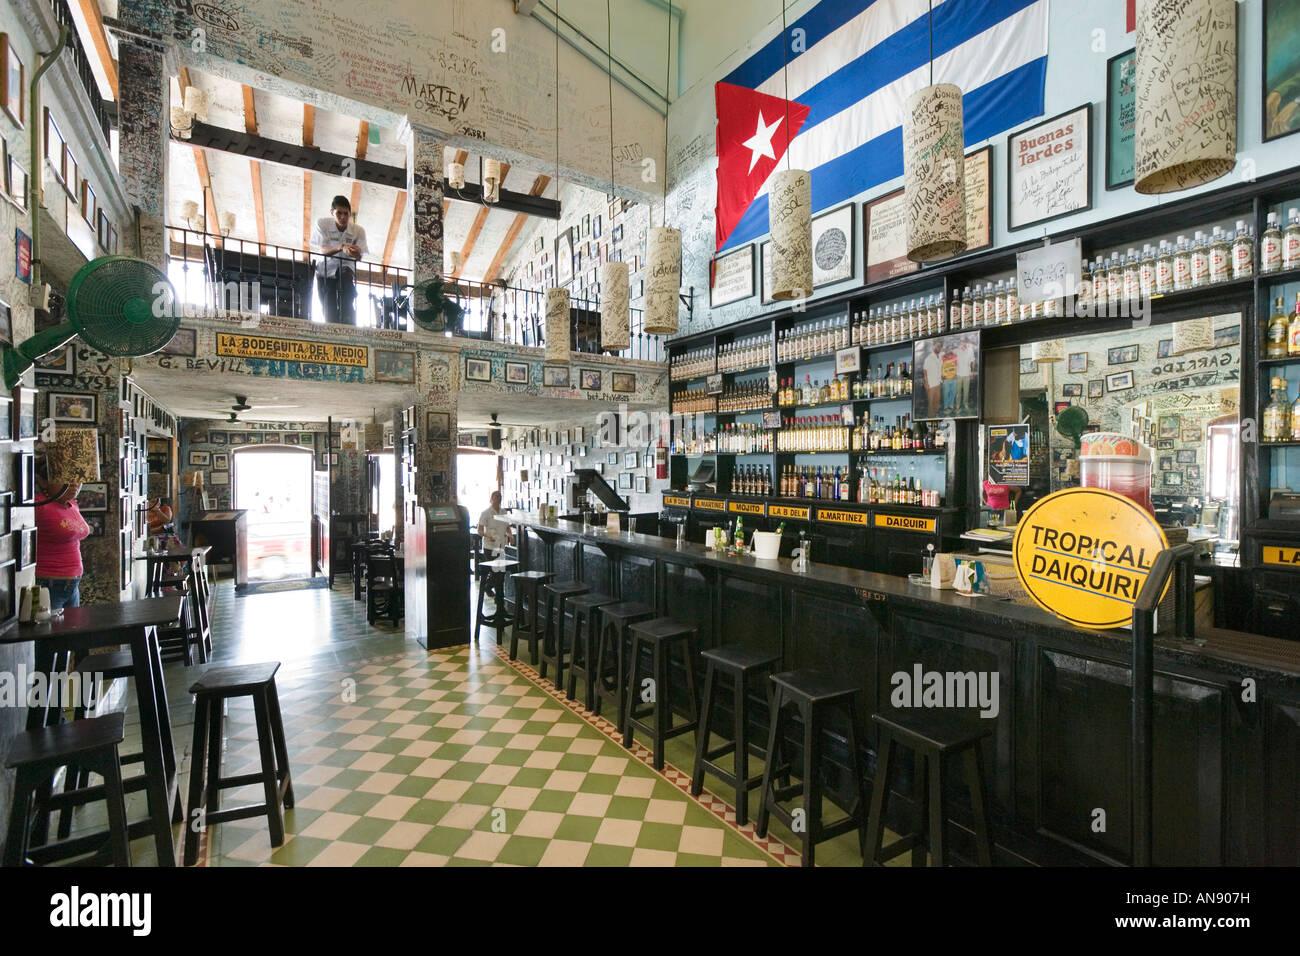 La Bodeguita Del Medio Cuban Restaurant Malecon Old Town  : la bodeguita del medio cuban restaurant malecon old town puerto vallarta AN907H from www.alamy.com size 1300 x 956 jpeg 256kB